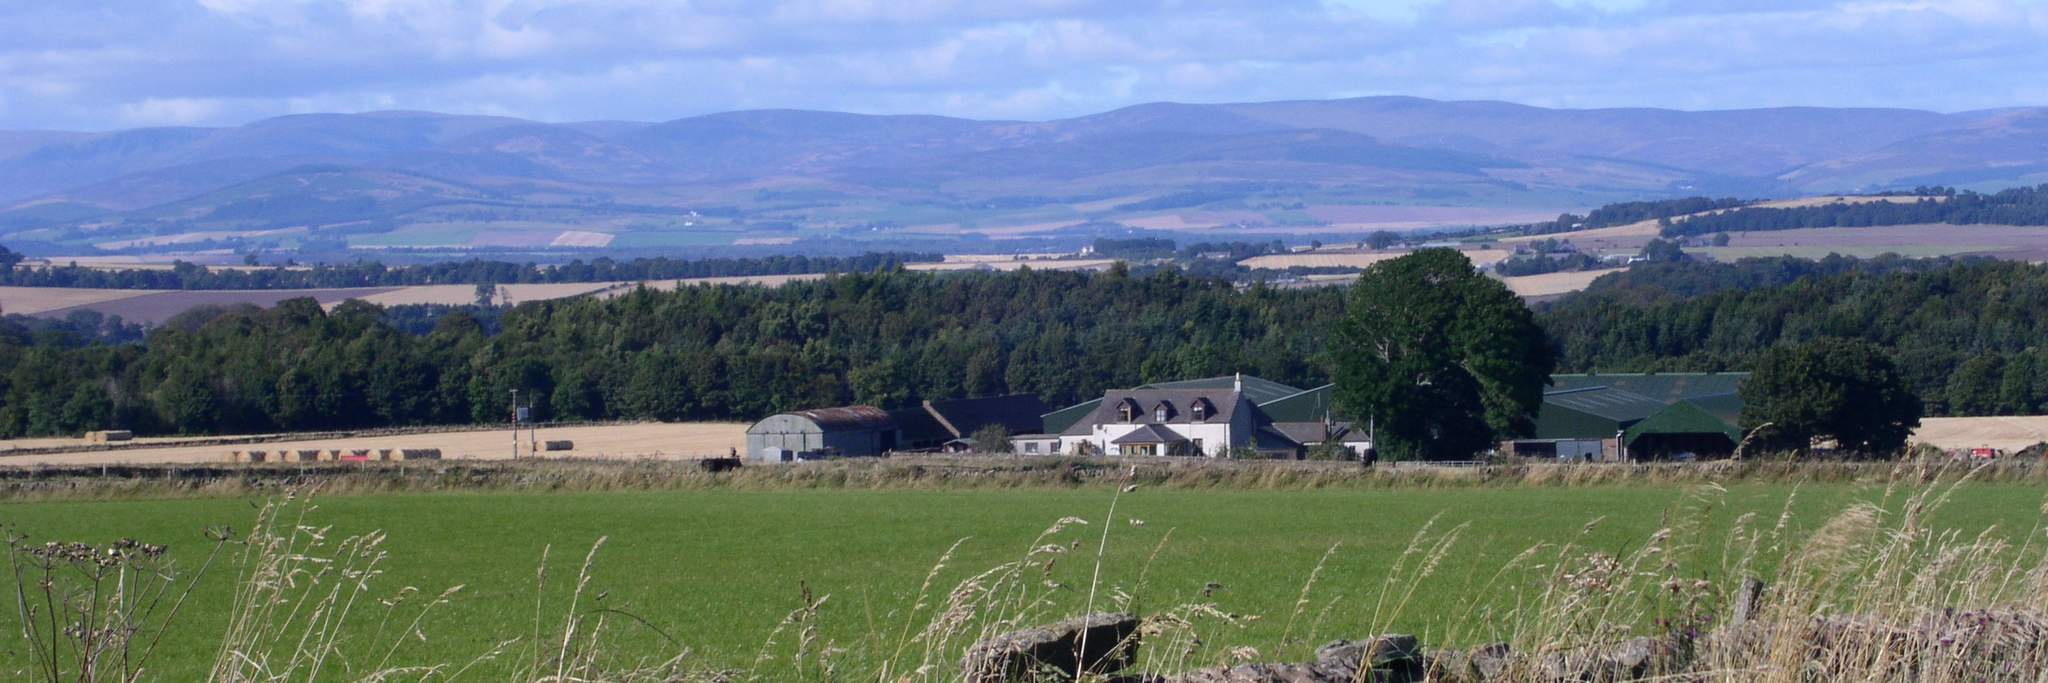 Newton Farm Holidays near Forfar